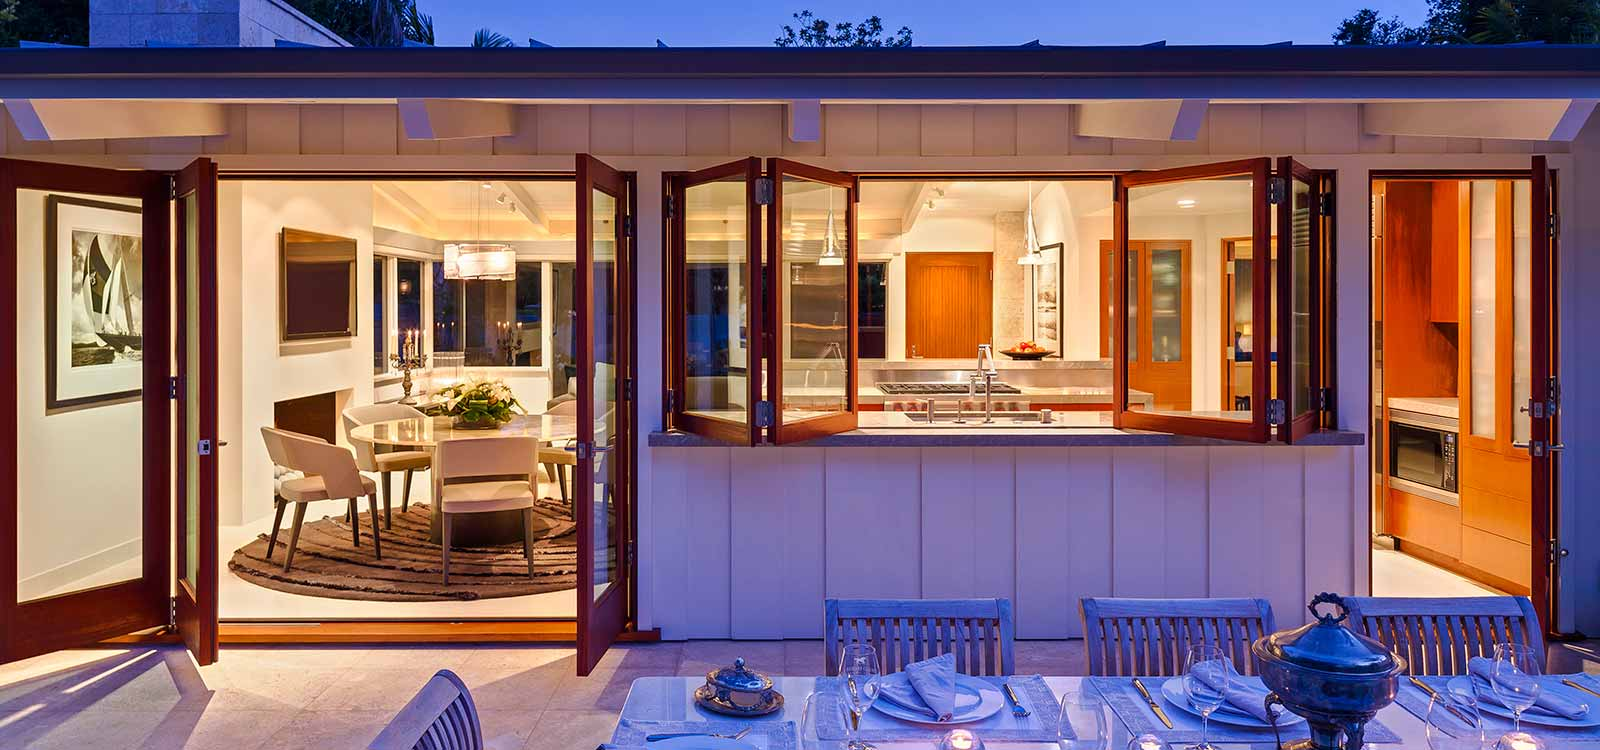 Desain Rumah 1 Lantai Bergaya Villa Modern